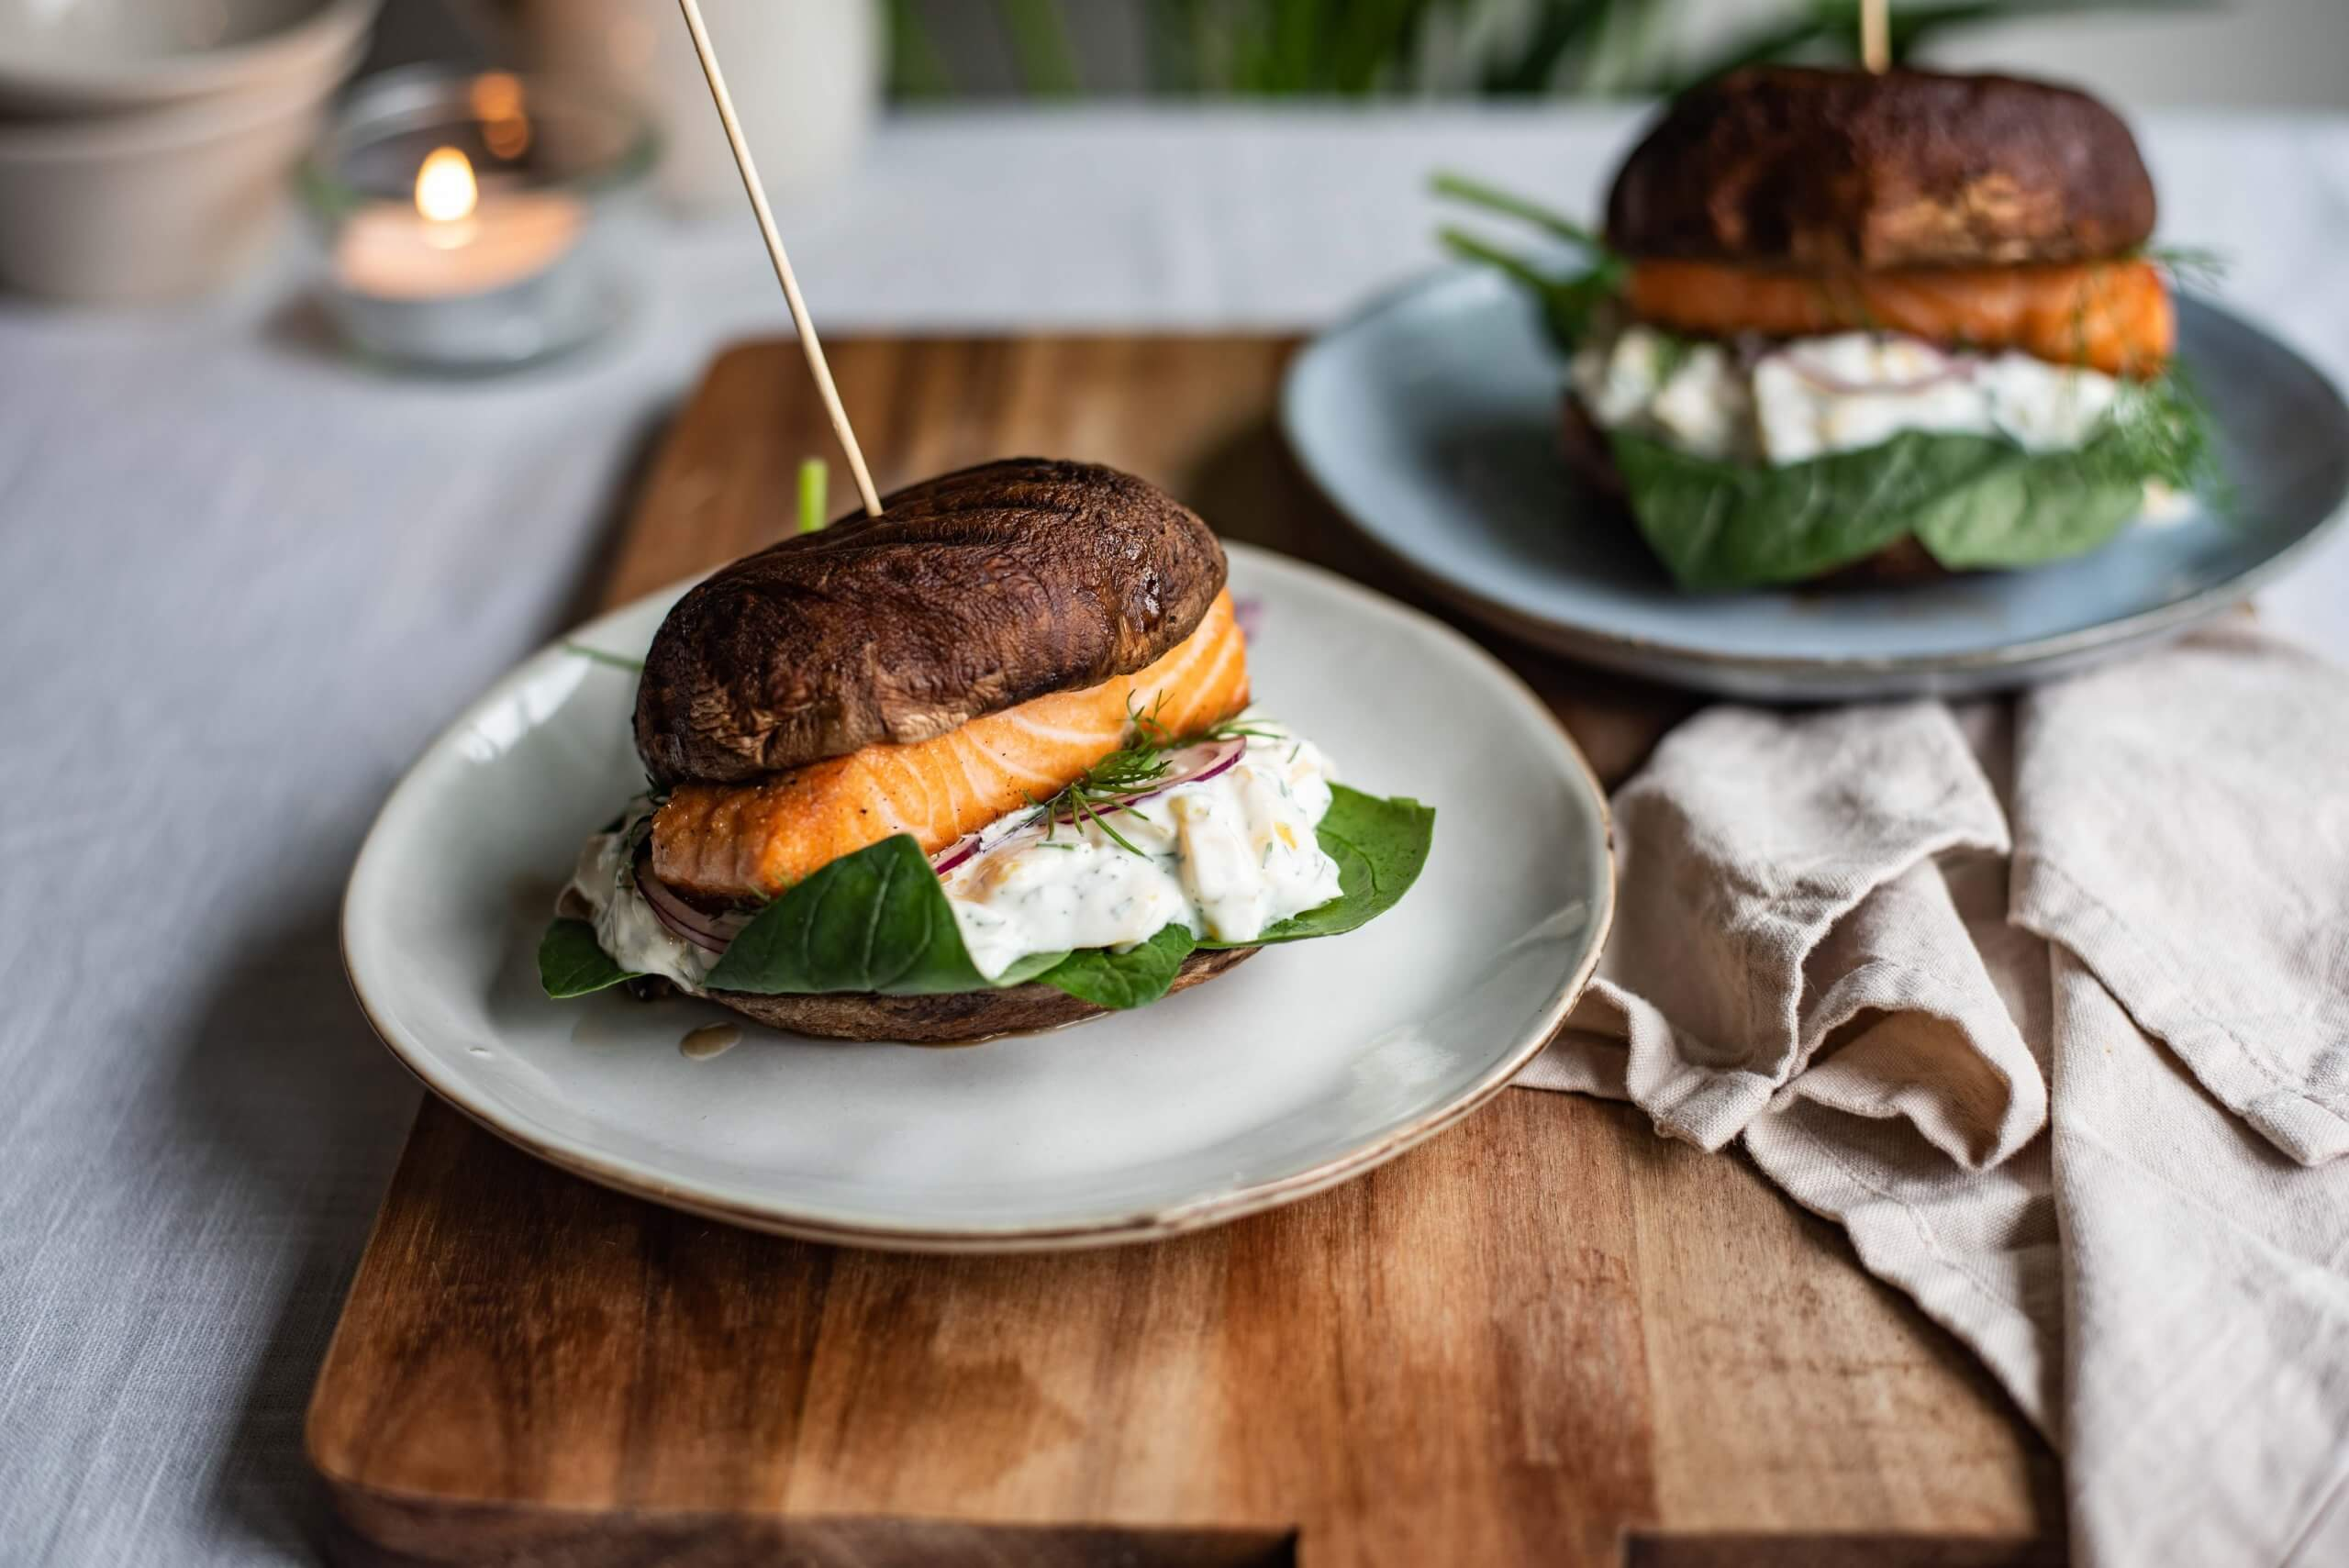 Portobelloburger met zalm